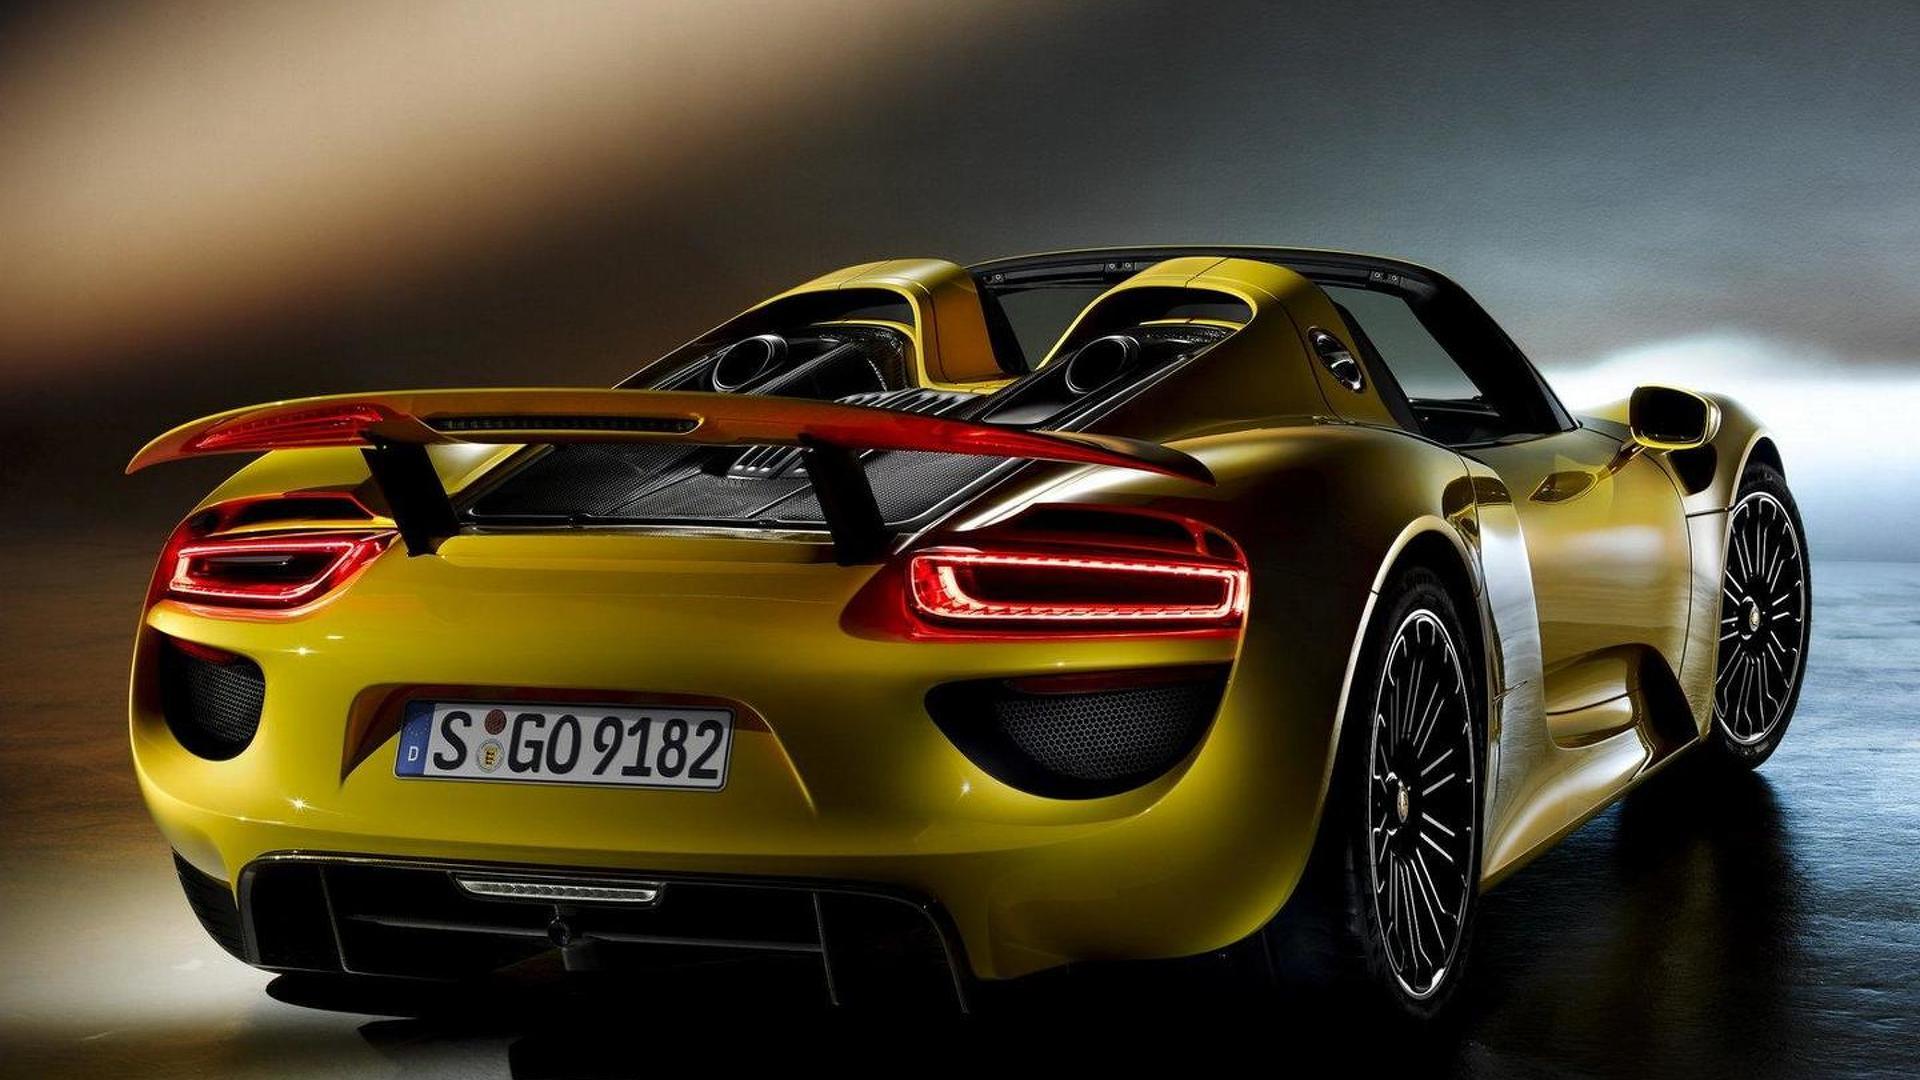 2013-433428-2014-porsche-918-spyder1 Amazing Porsche 918 Spyder sold Out Cars Trend